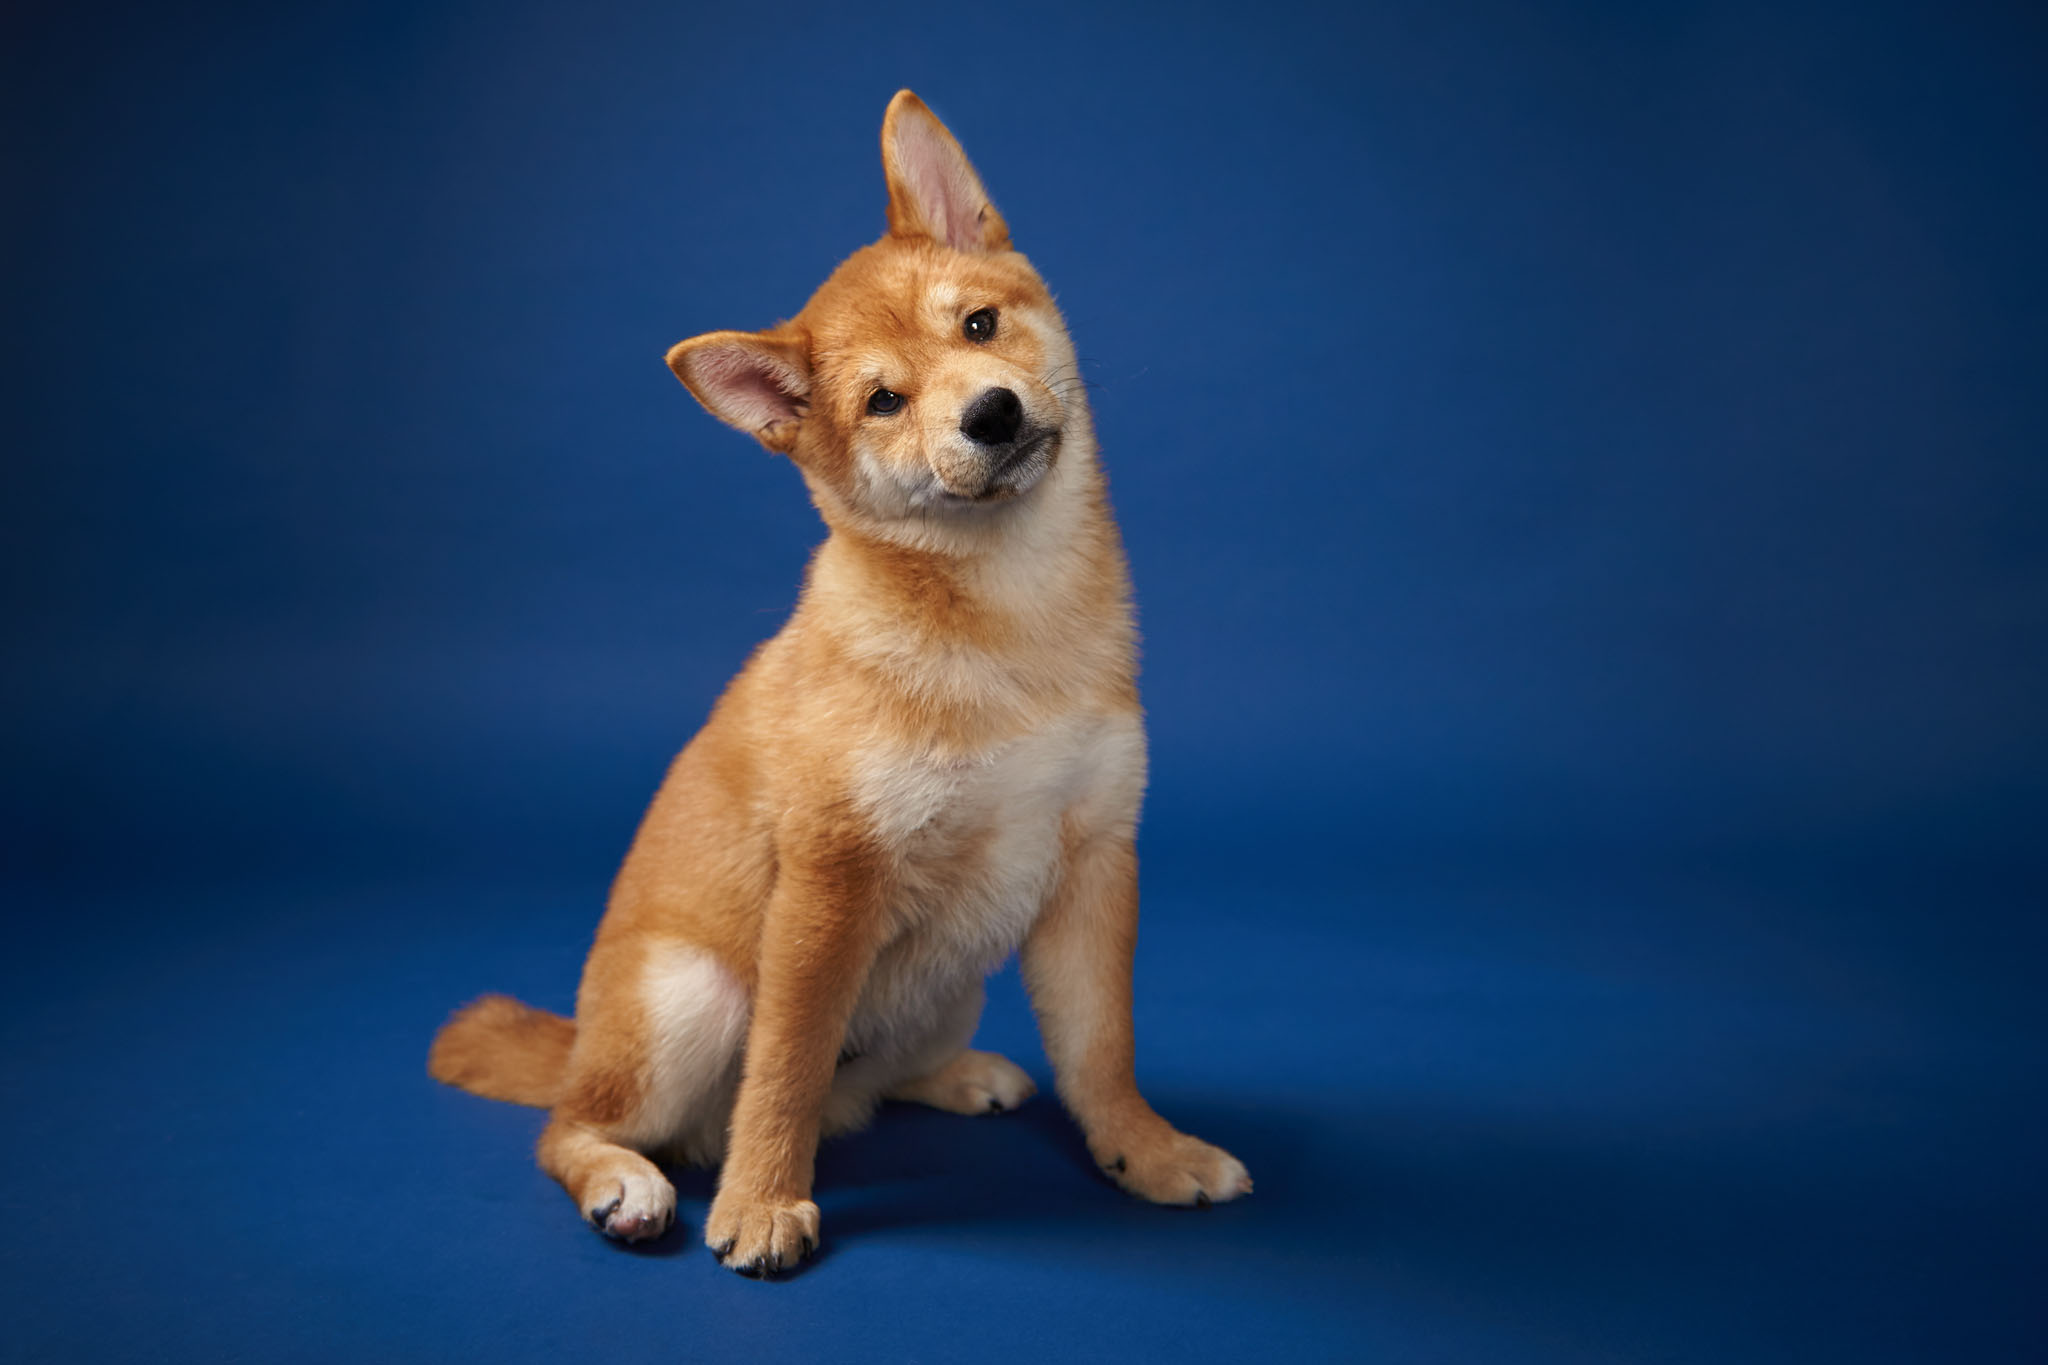 boprey-pet-photography-studio-nyc_21.jpg